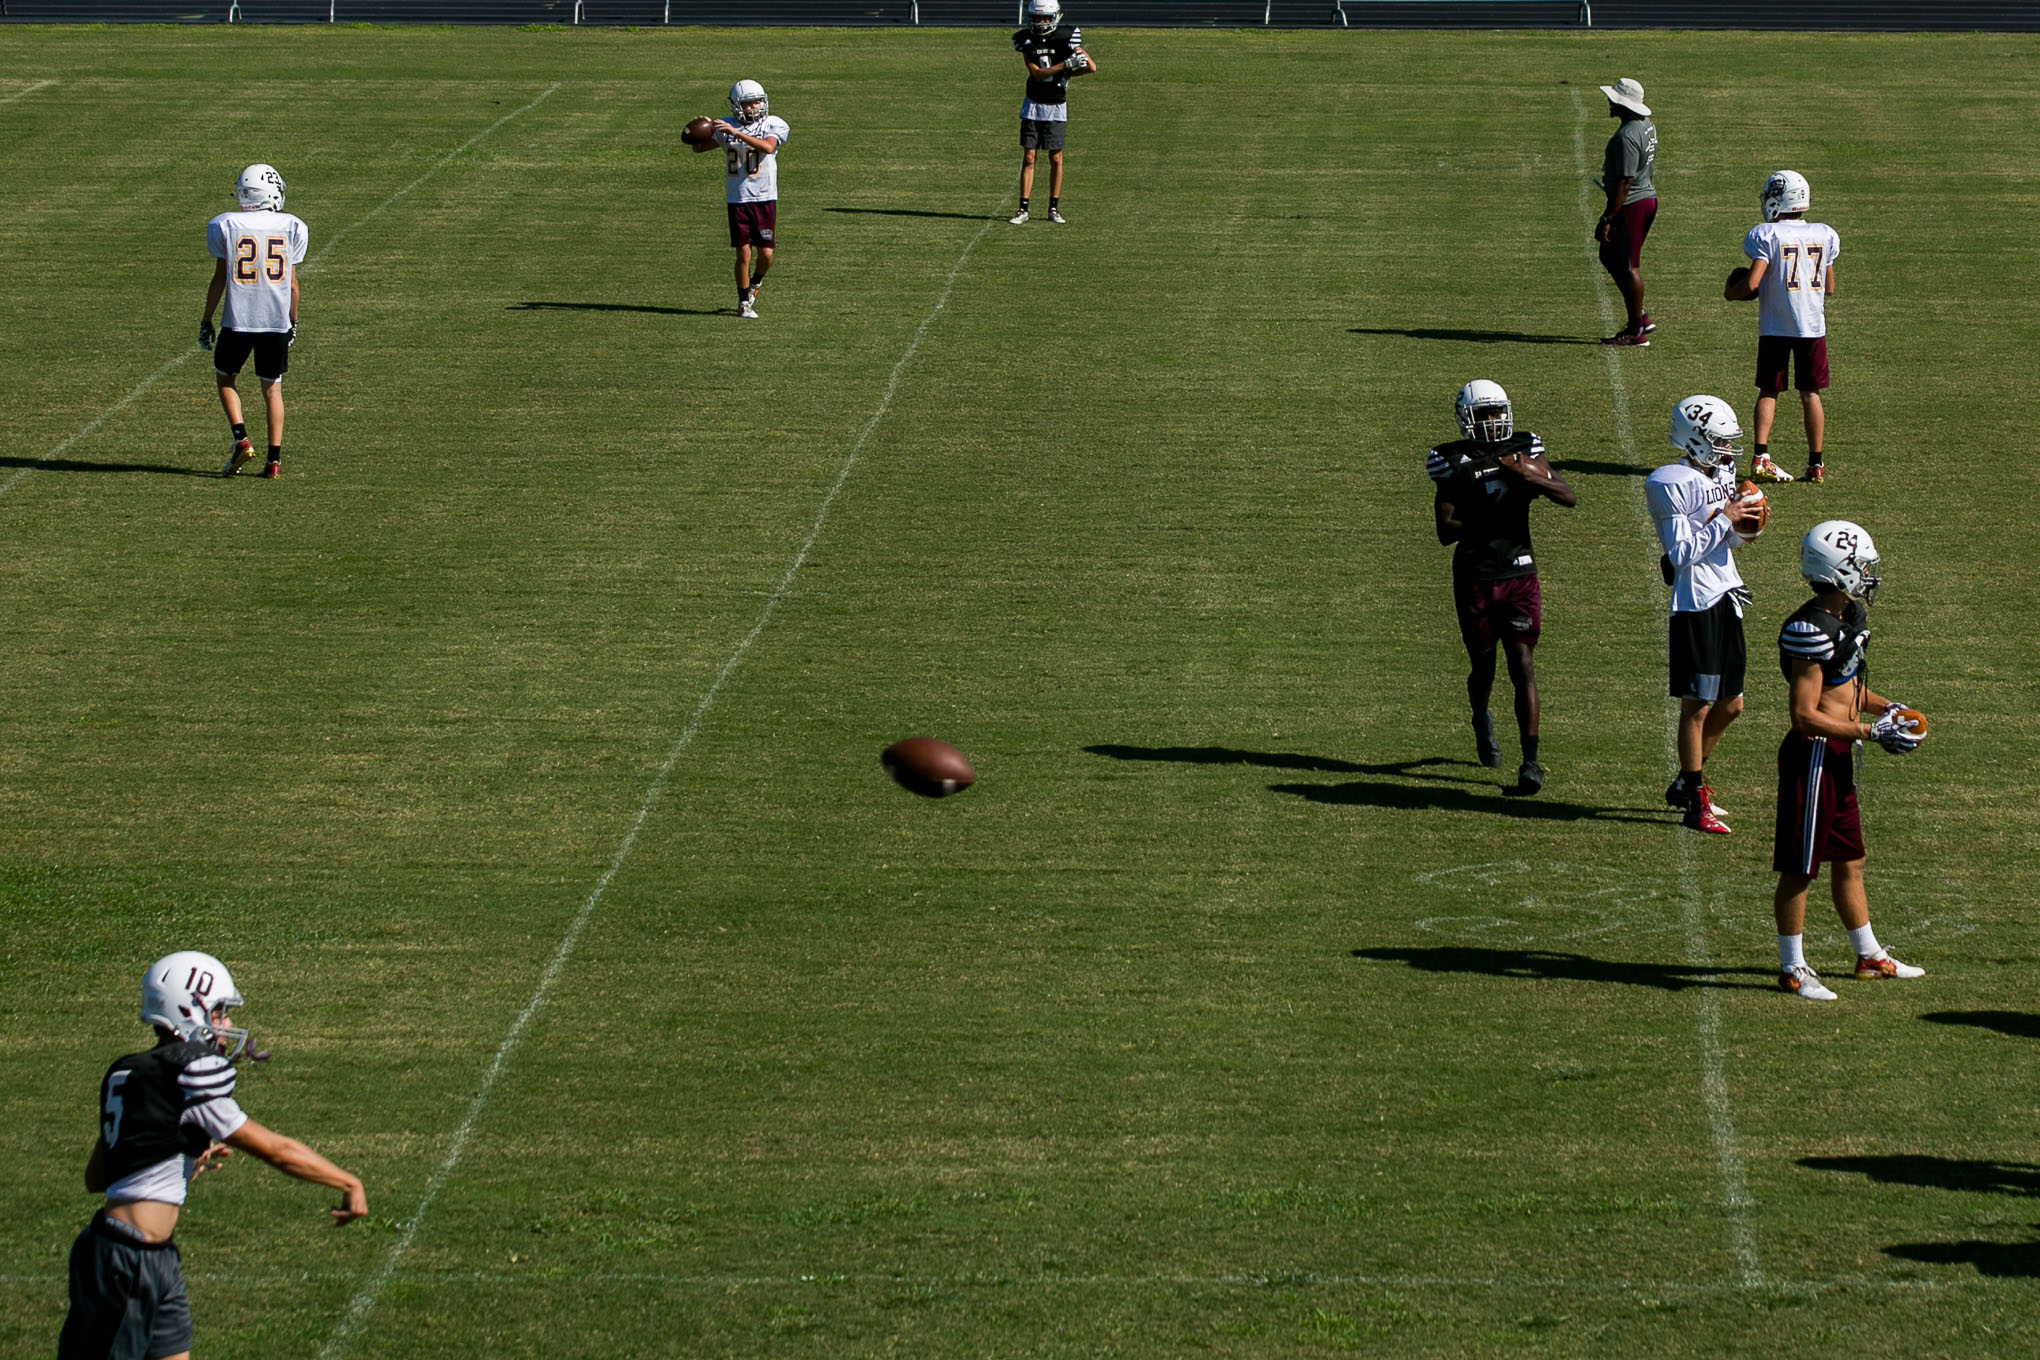 San Antonio Christian football team warms up for practice.